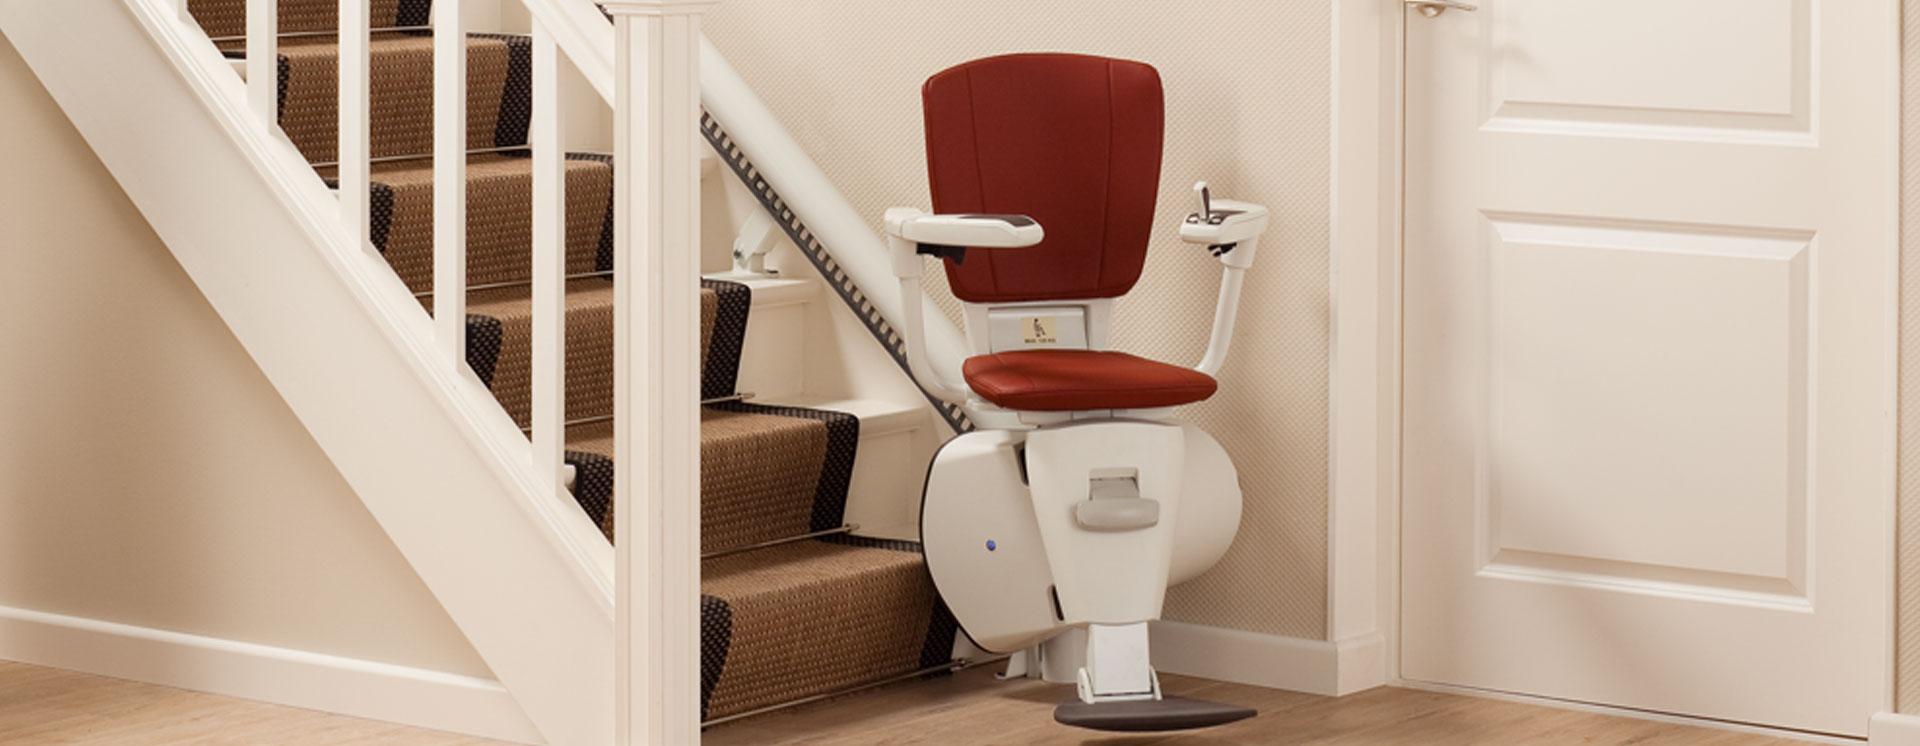 Powered Swivel Seat